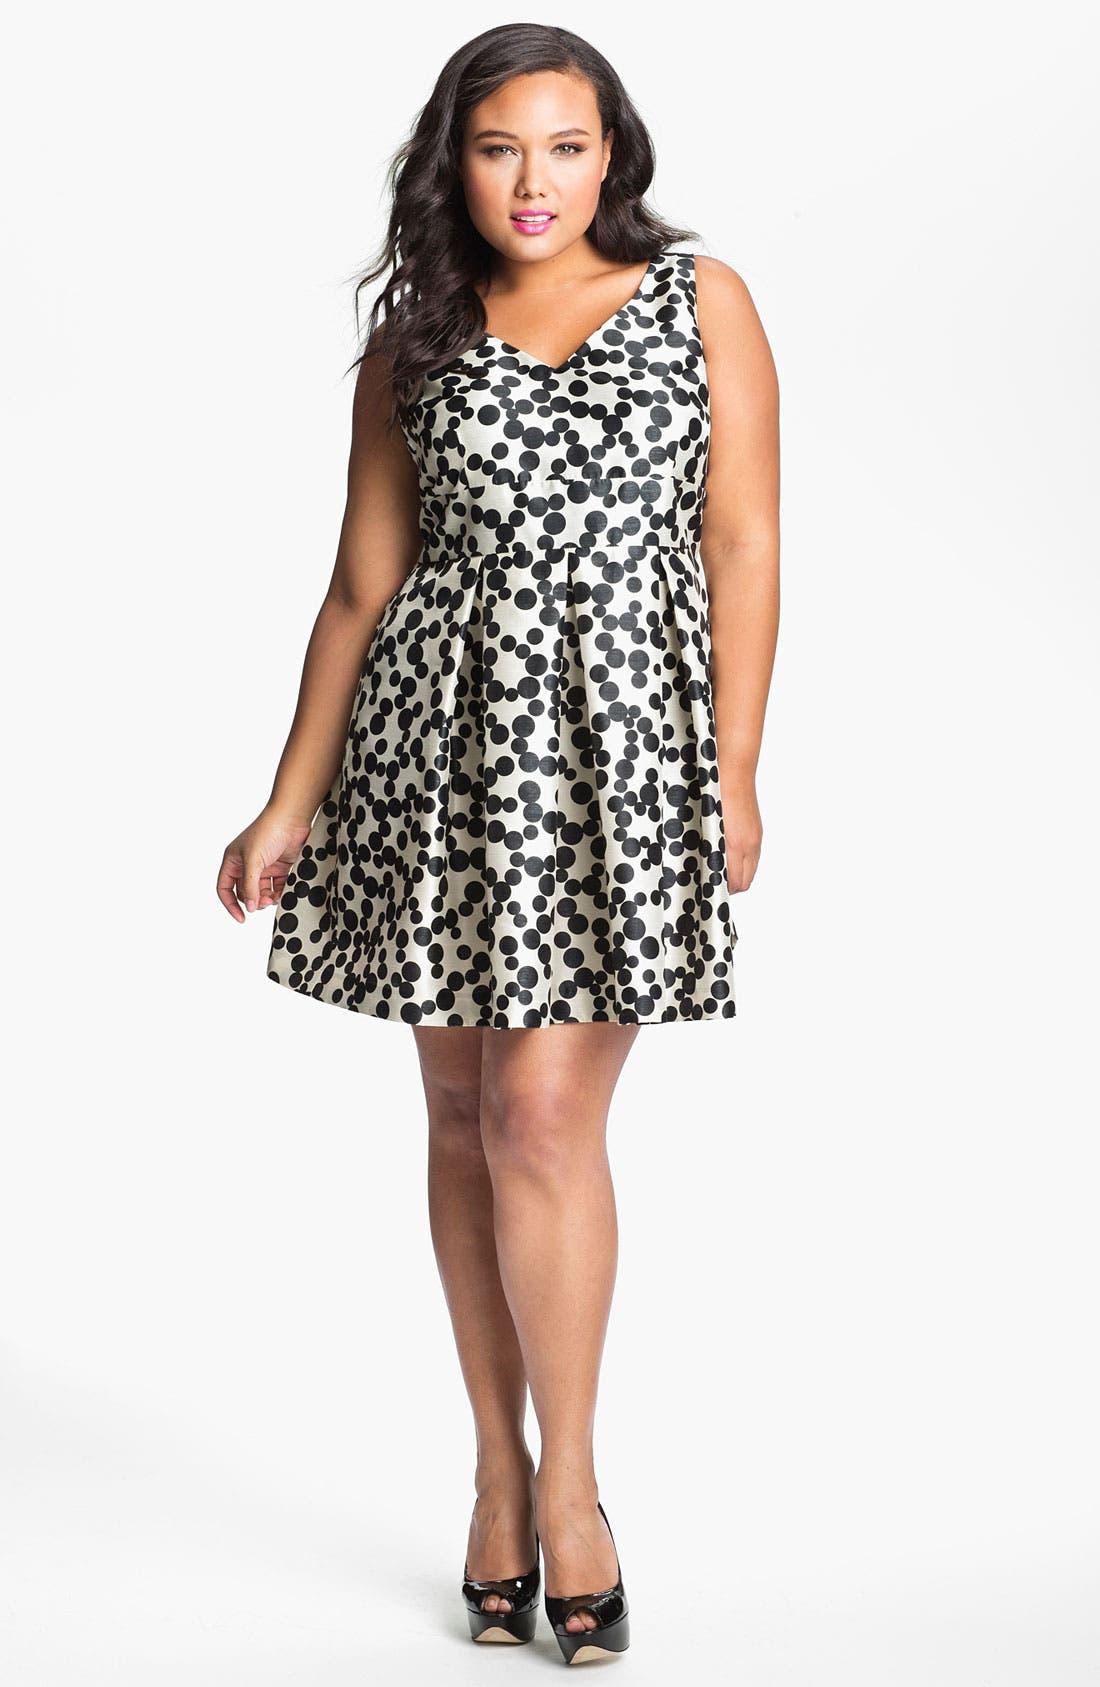 Alternate Image 1 Selected - Taylor Dresses Polka Dot Fit & Flare Dress (Plus Size)